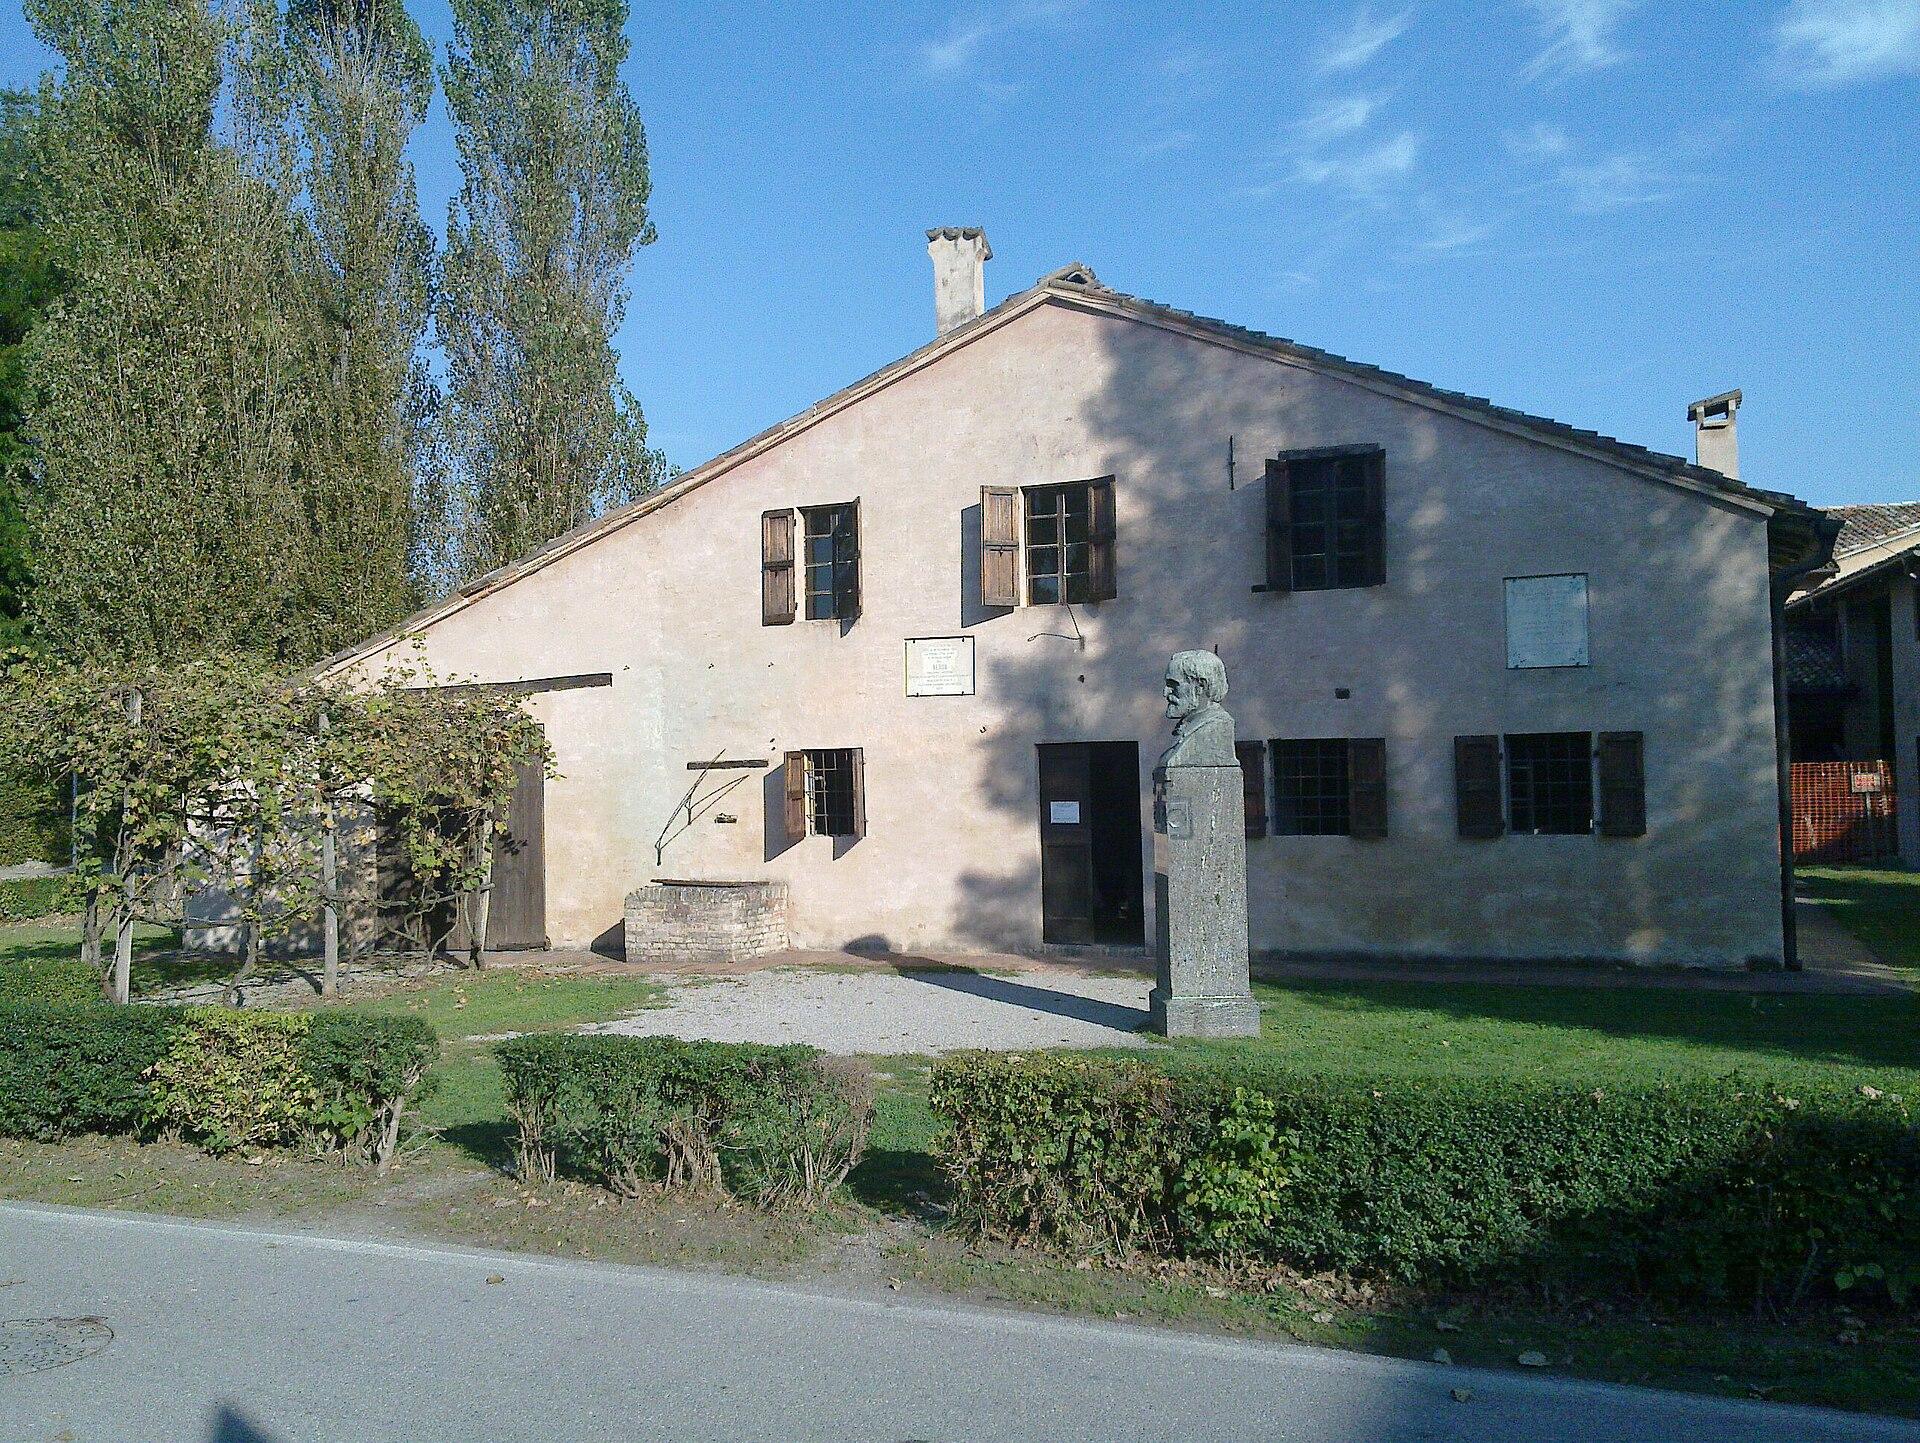 Casa natale di giuseppe verdi wikipedia for Foto di case